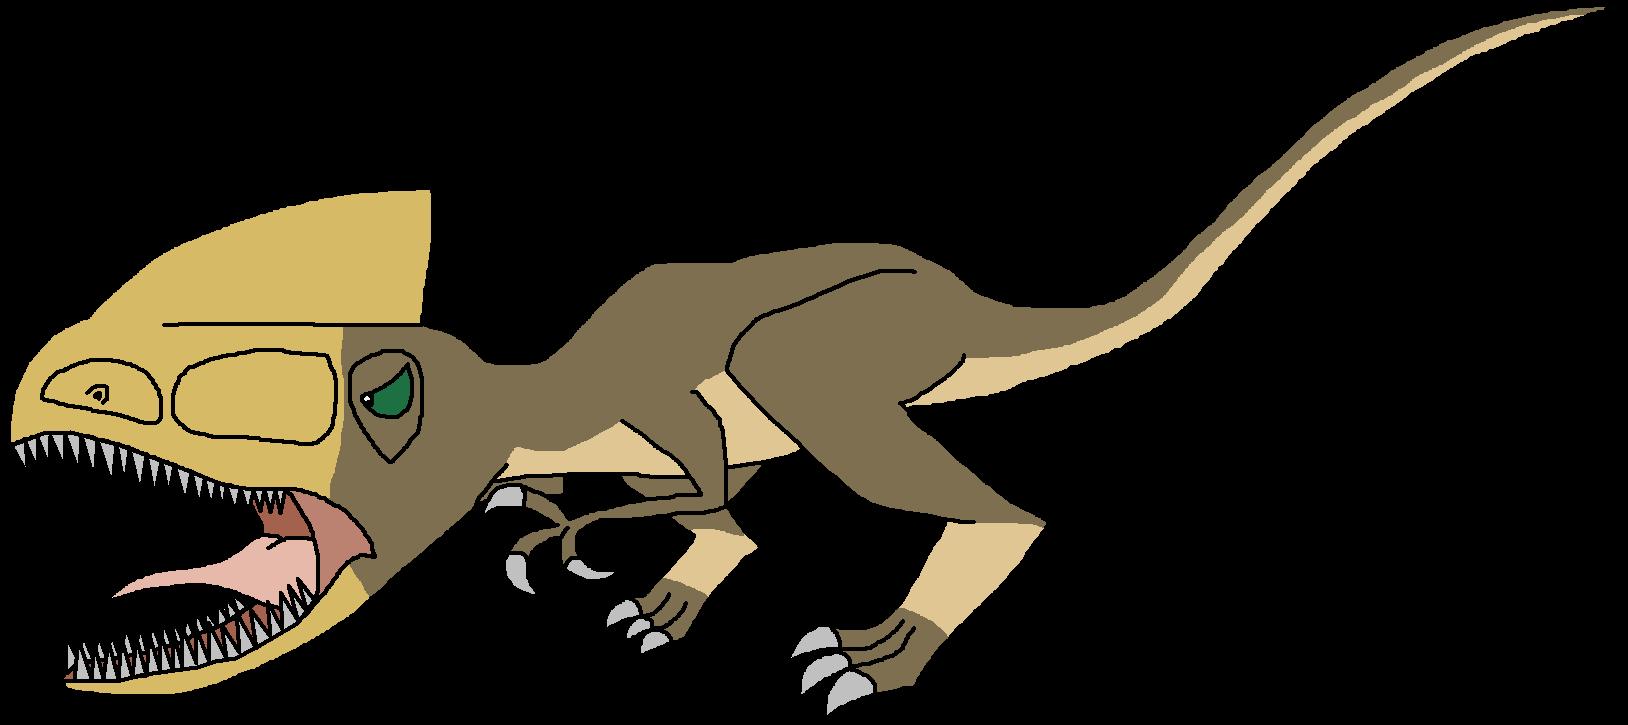 Dinosaur clipart velociraptor. Image guanlong png pedia